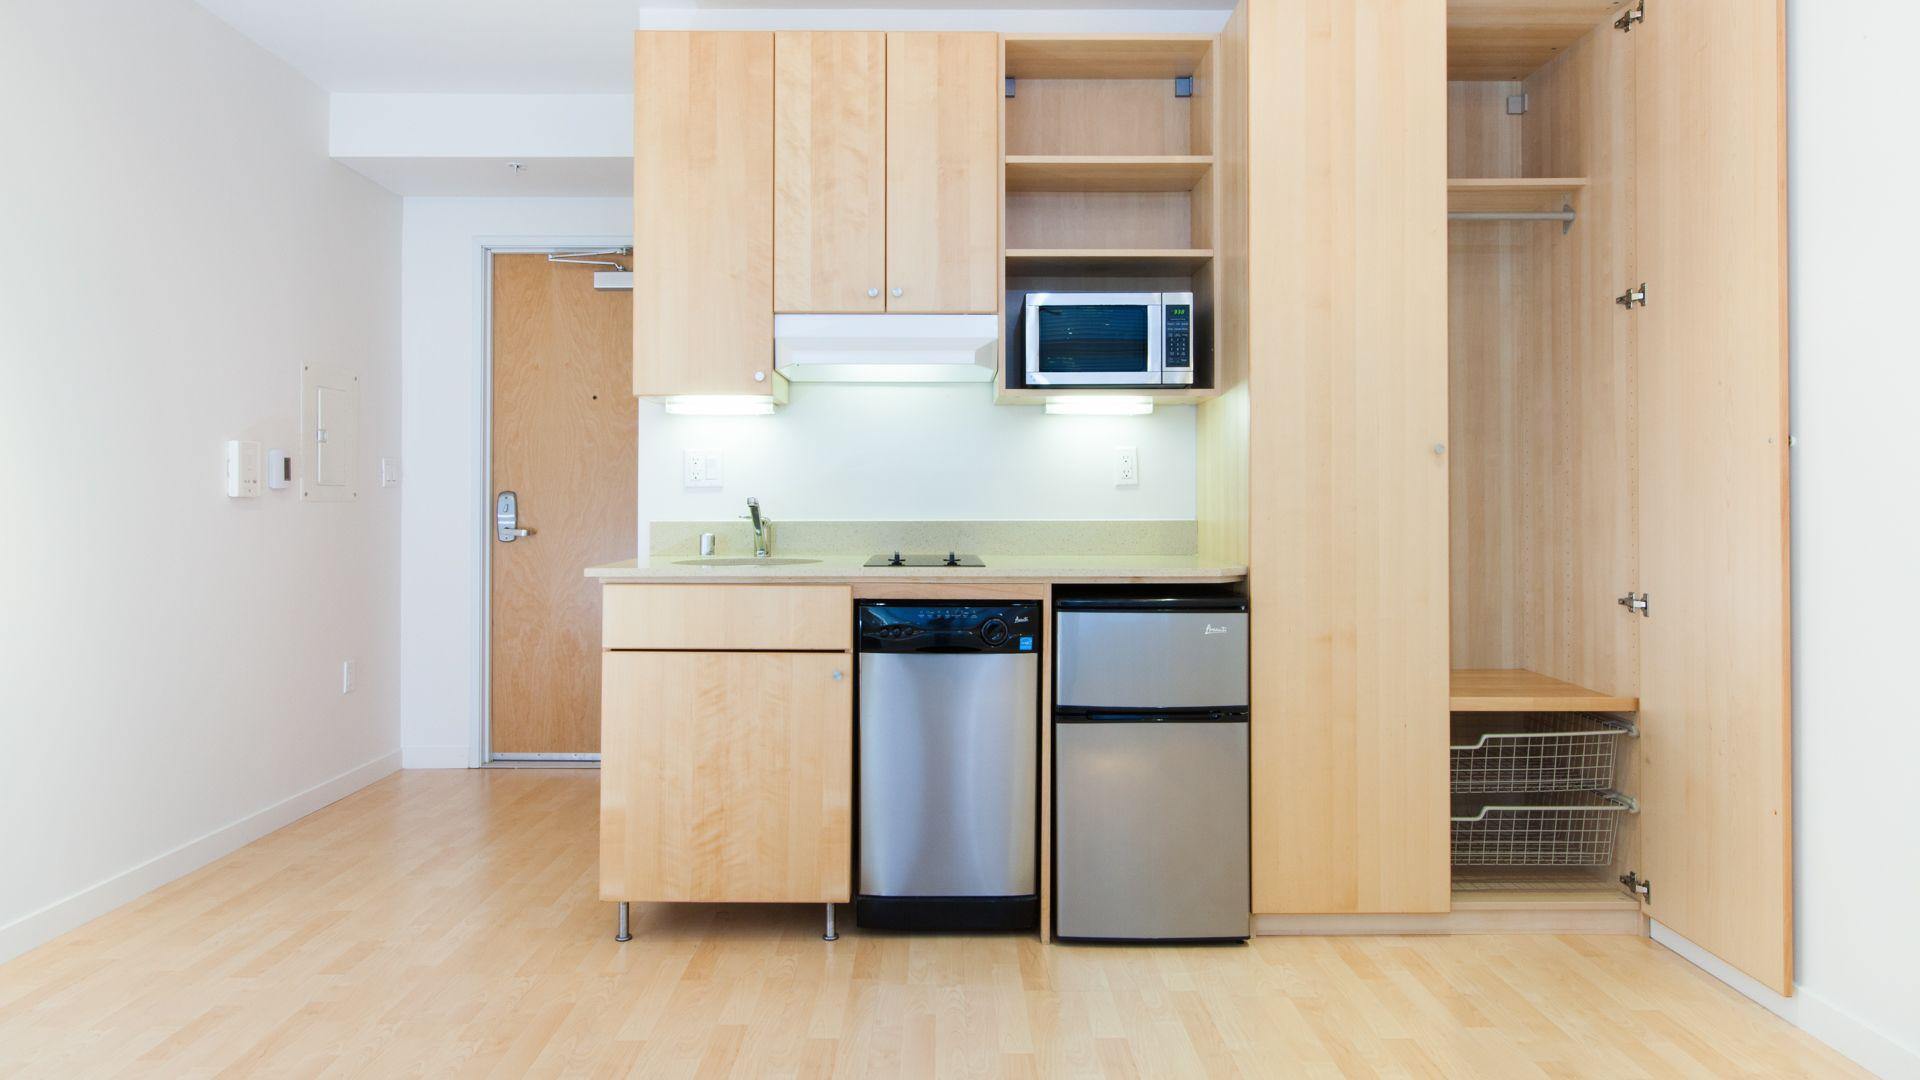 77 Bluxome Apartments - Kitchenette